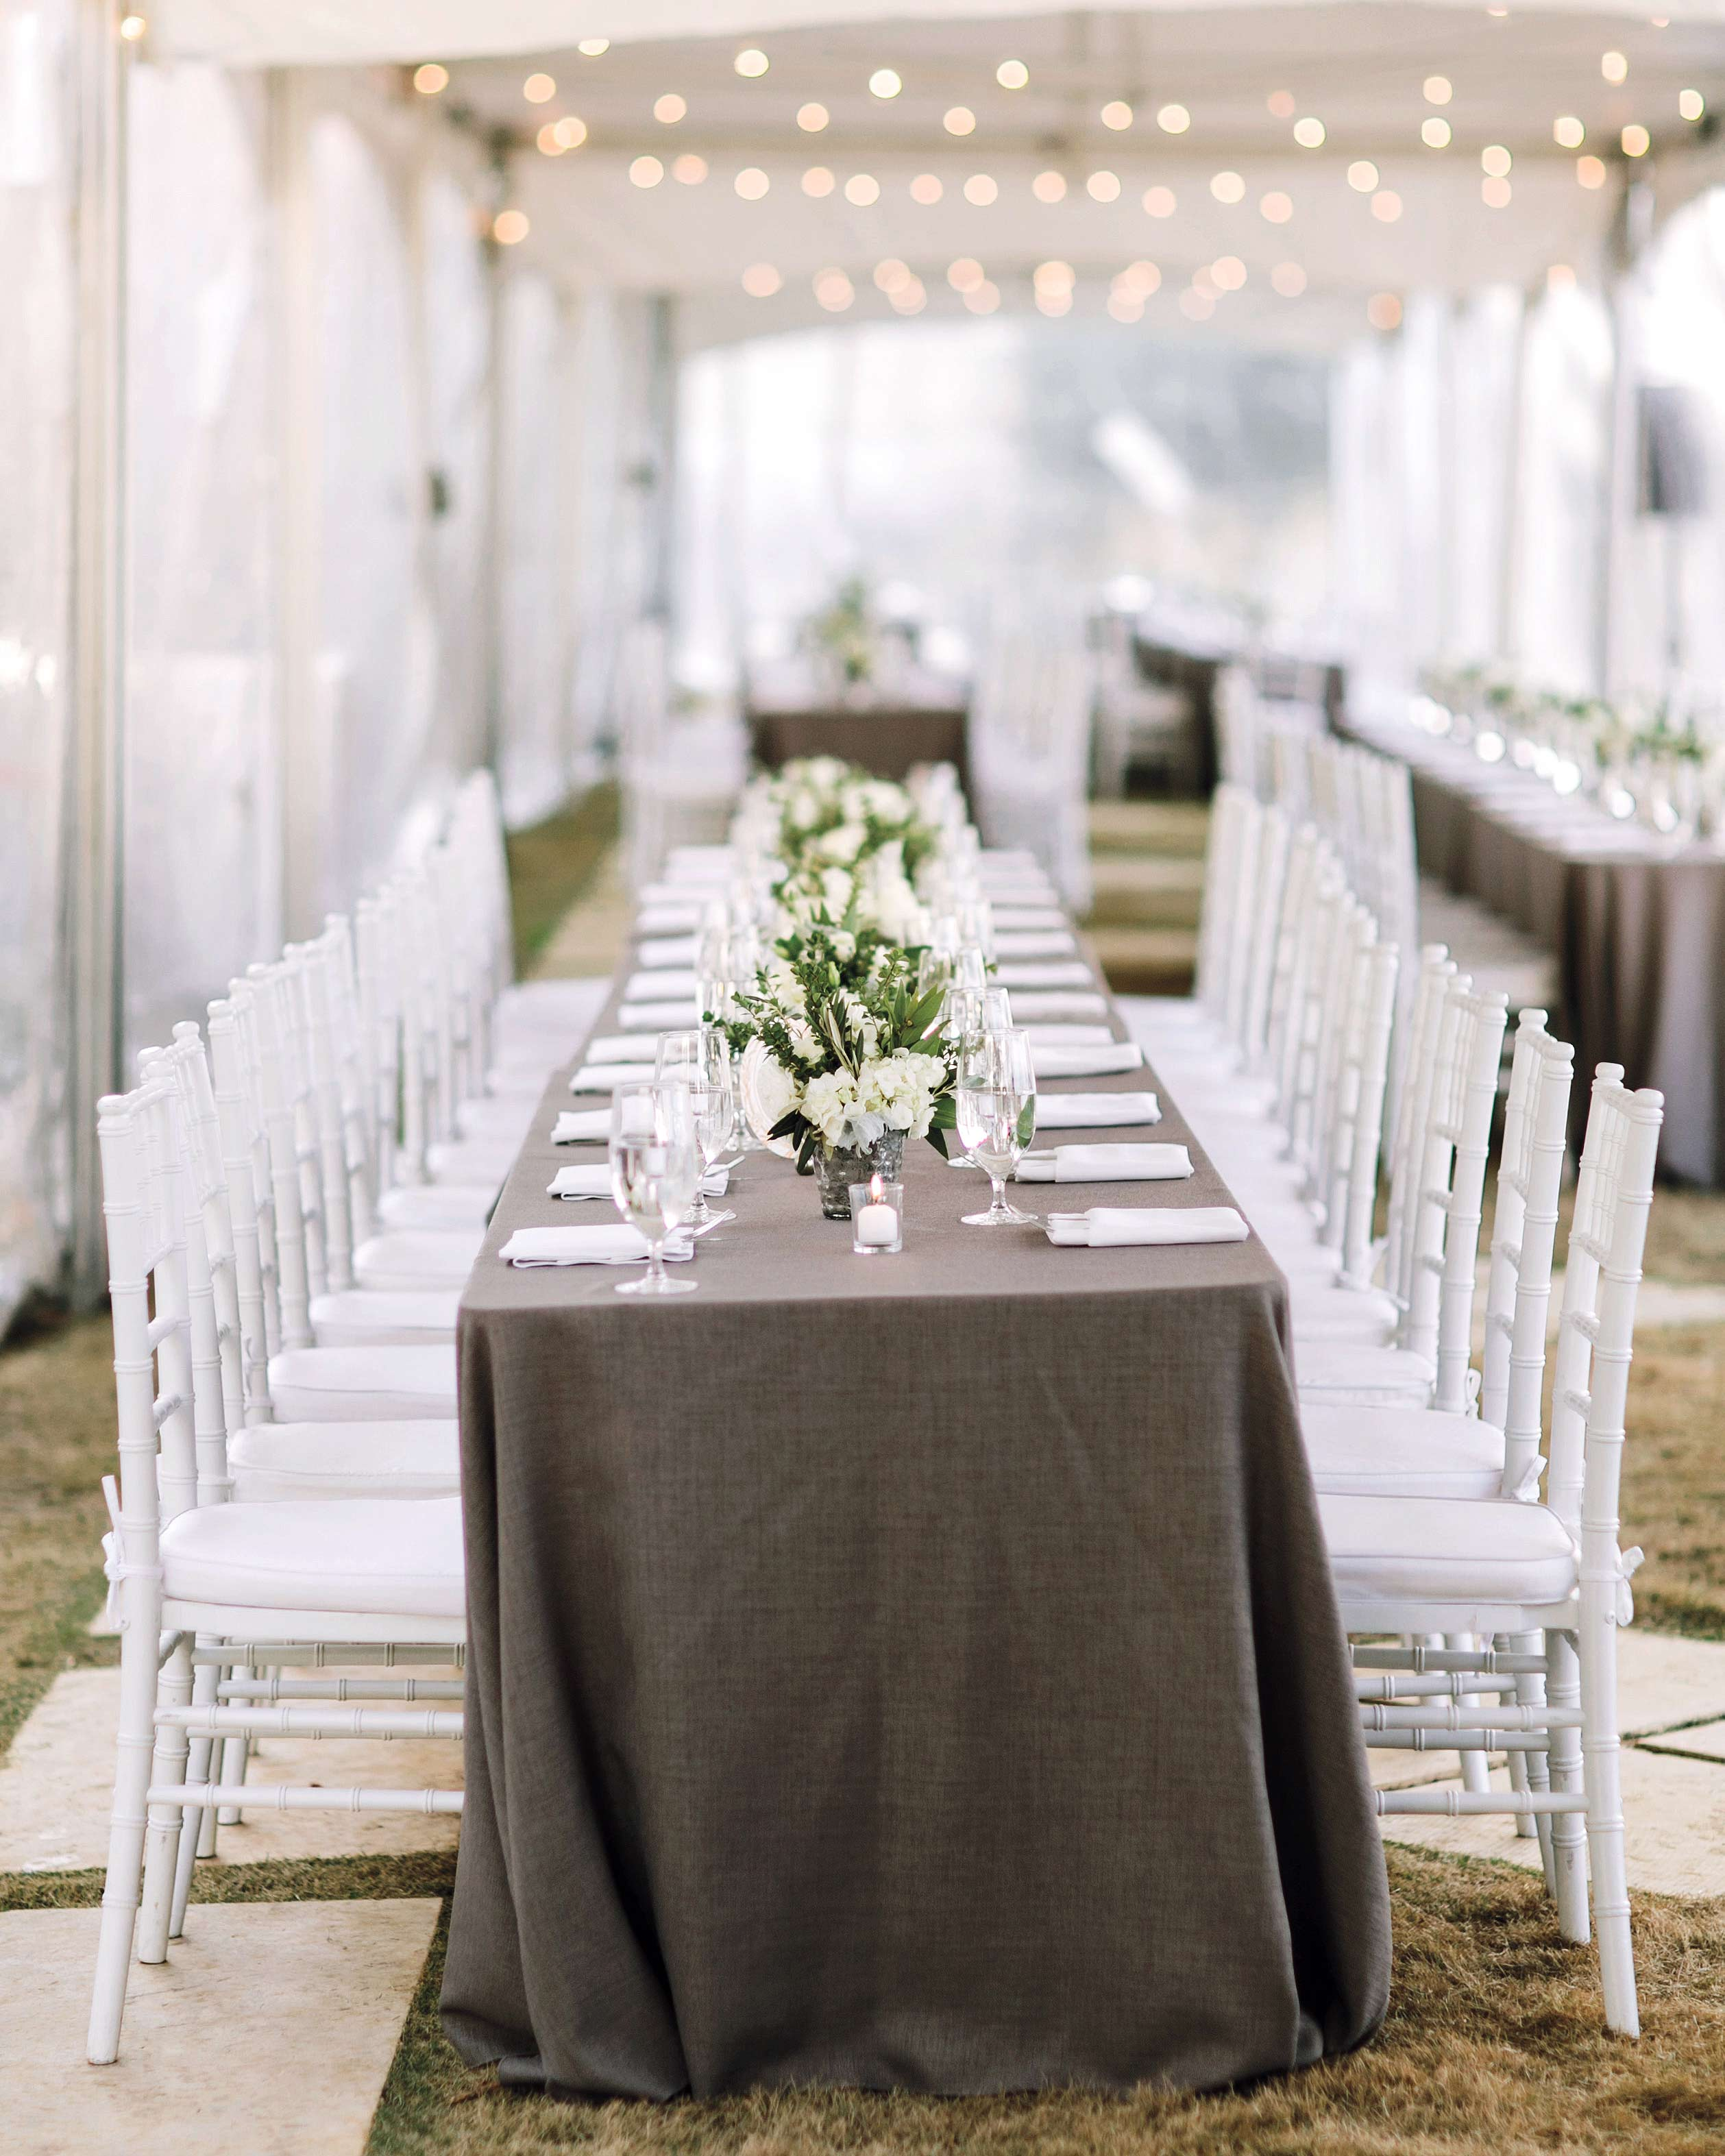 mmallory-diego-wedding-texas-reception-tables-outdoor-102-s112628.jpg